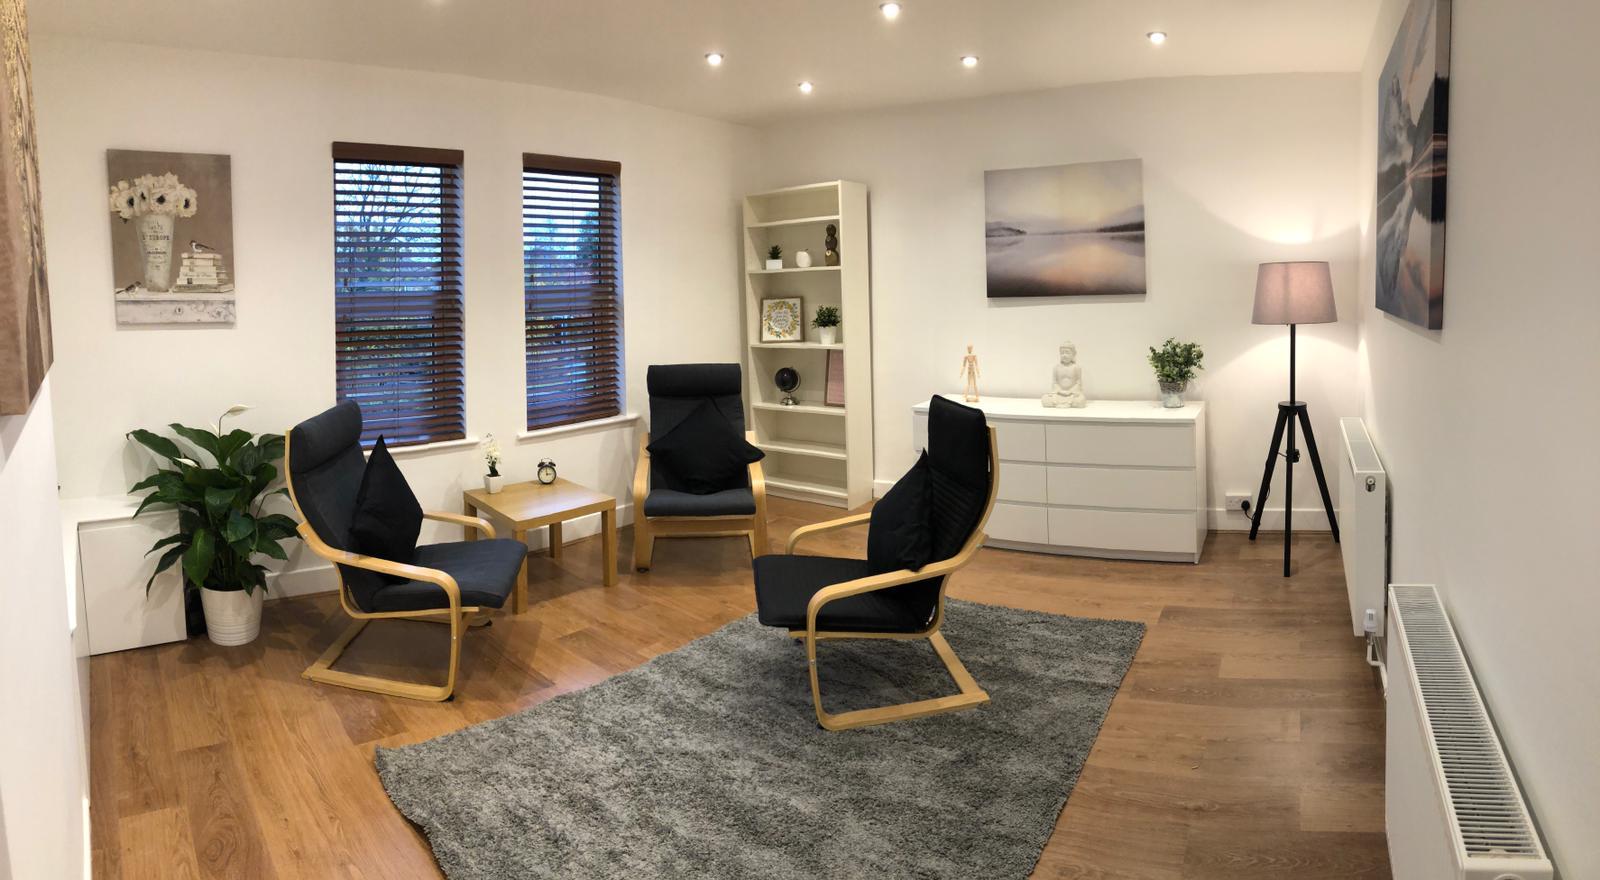 nottingham-Specialist-psychology Clinic